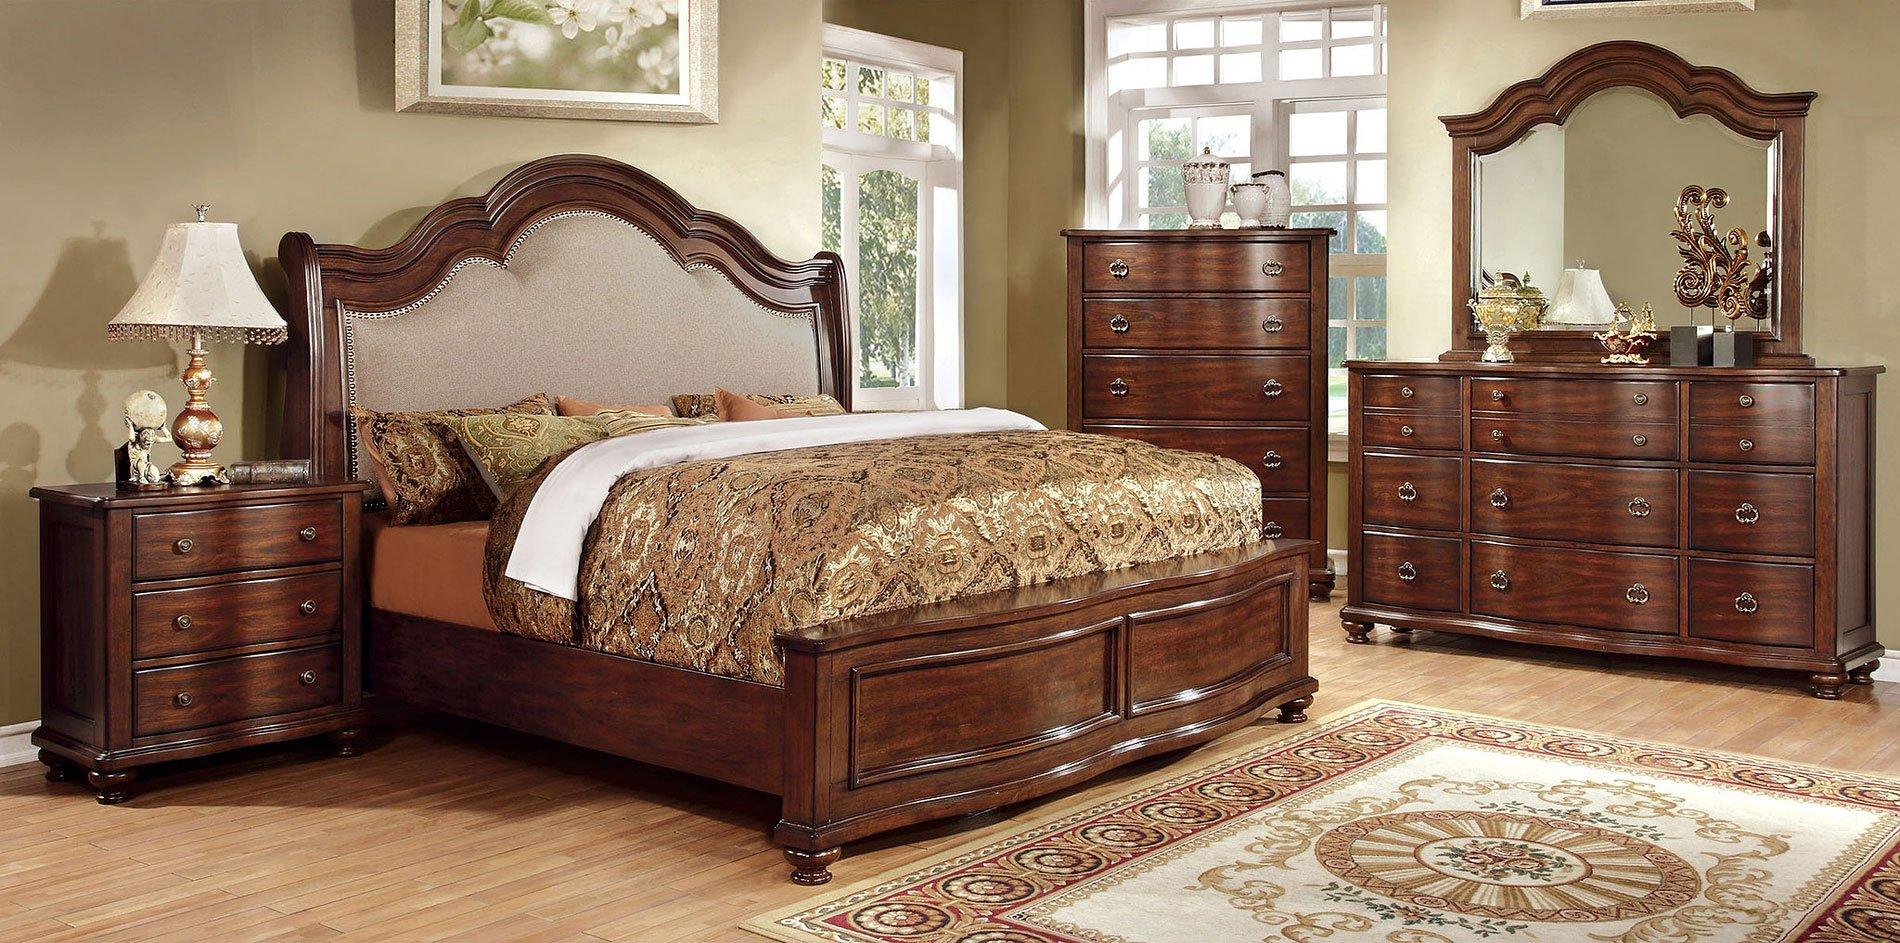 Bellavista Low Footboard Bedroom Set Furniture Of America